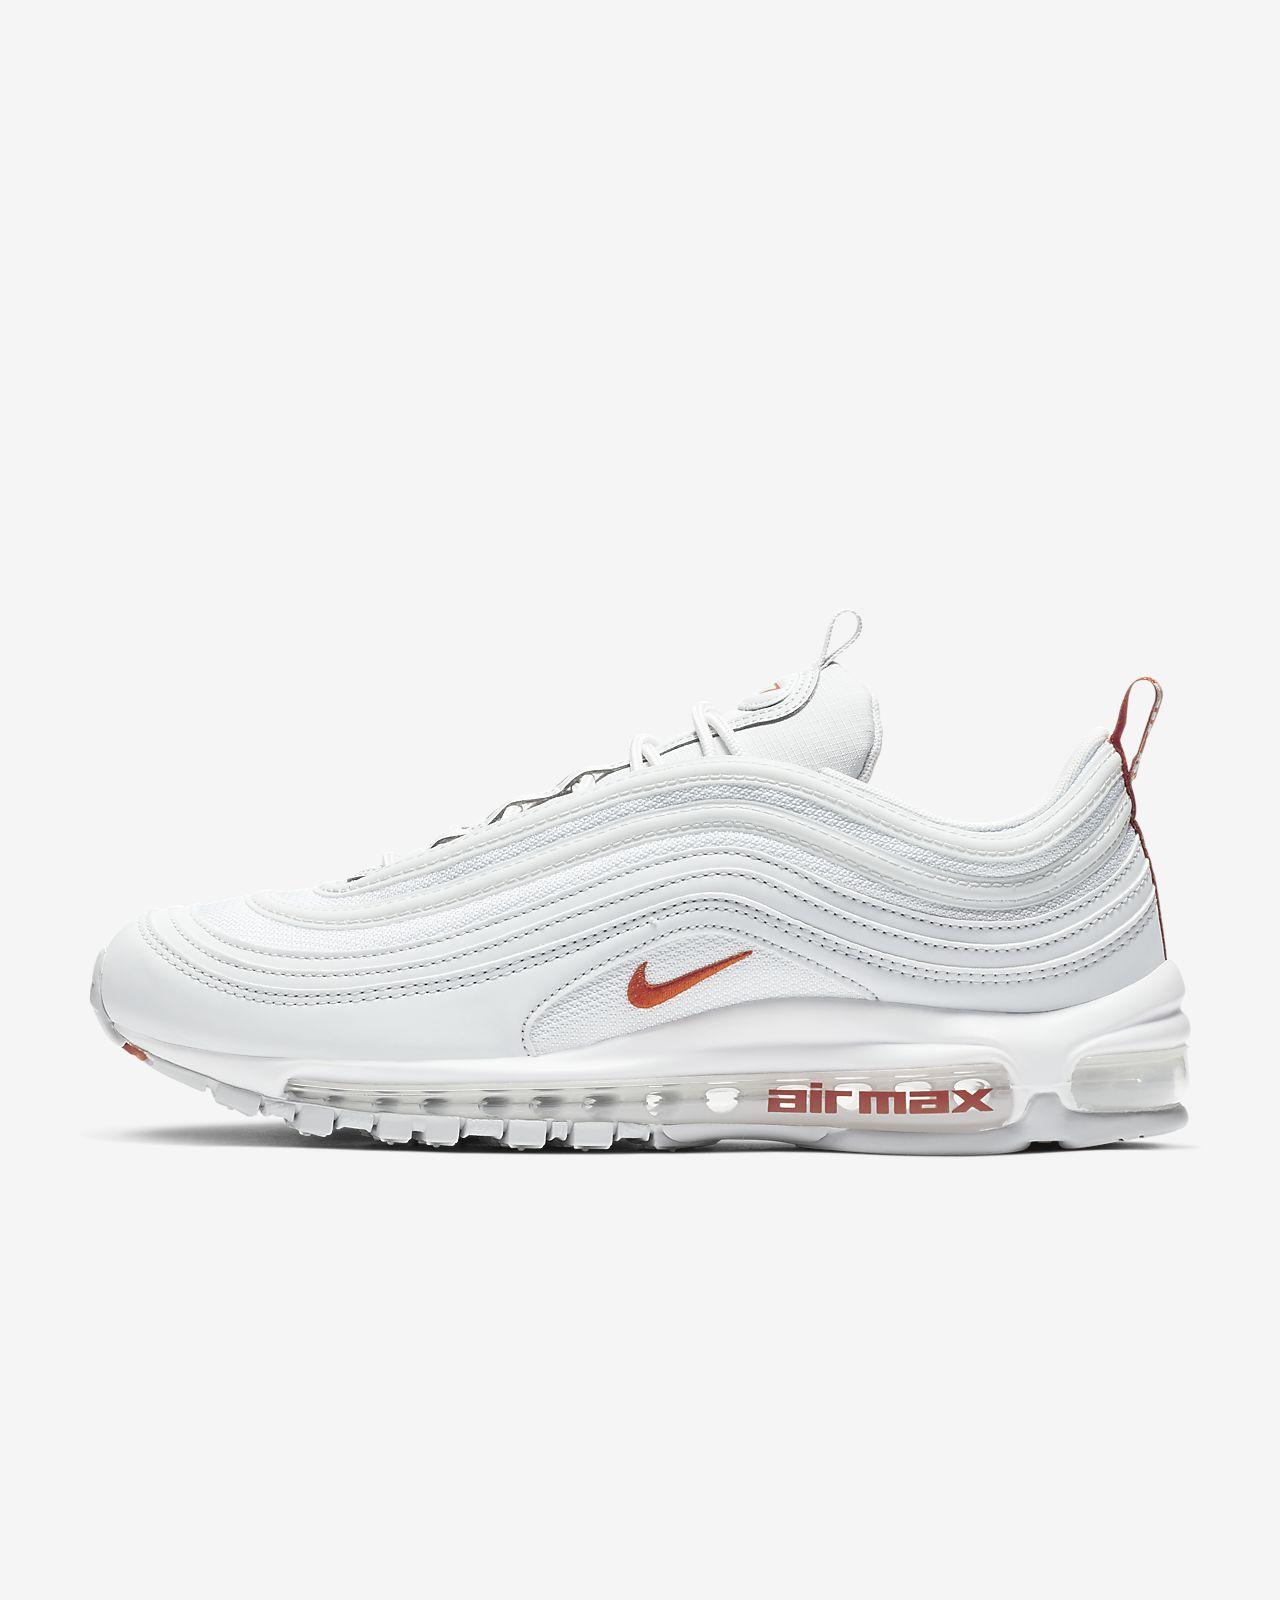 4eff82c4ce Nike Air Max 97 Men's Shoe. Nike.com SE